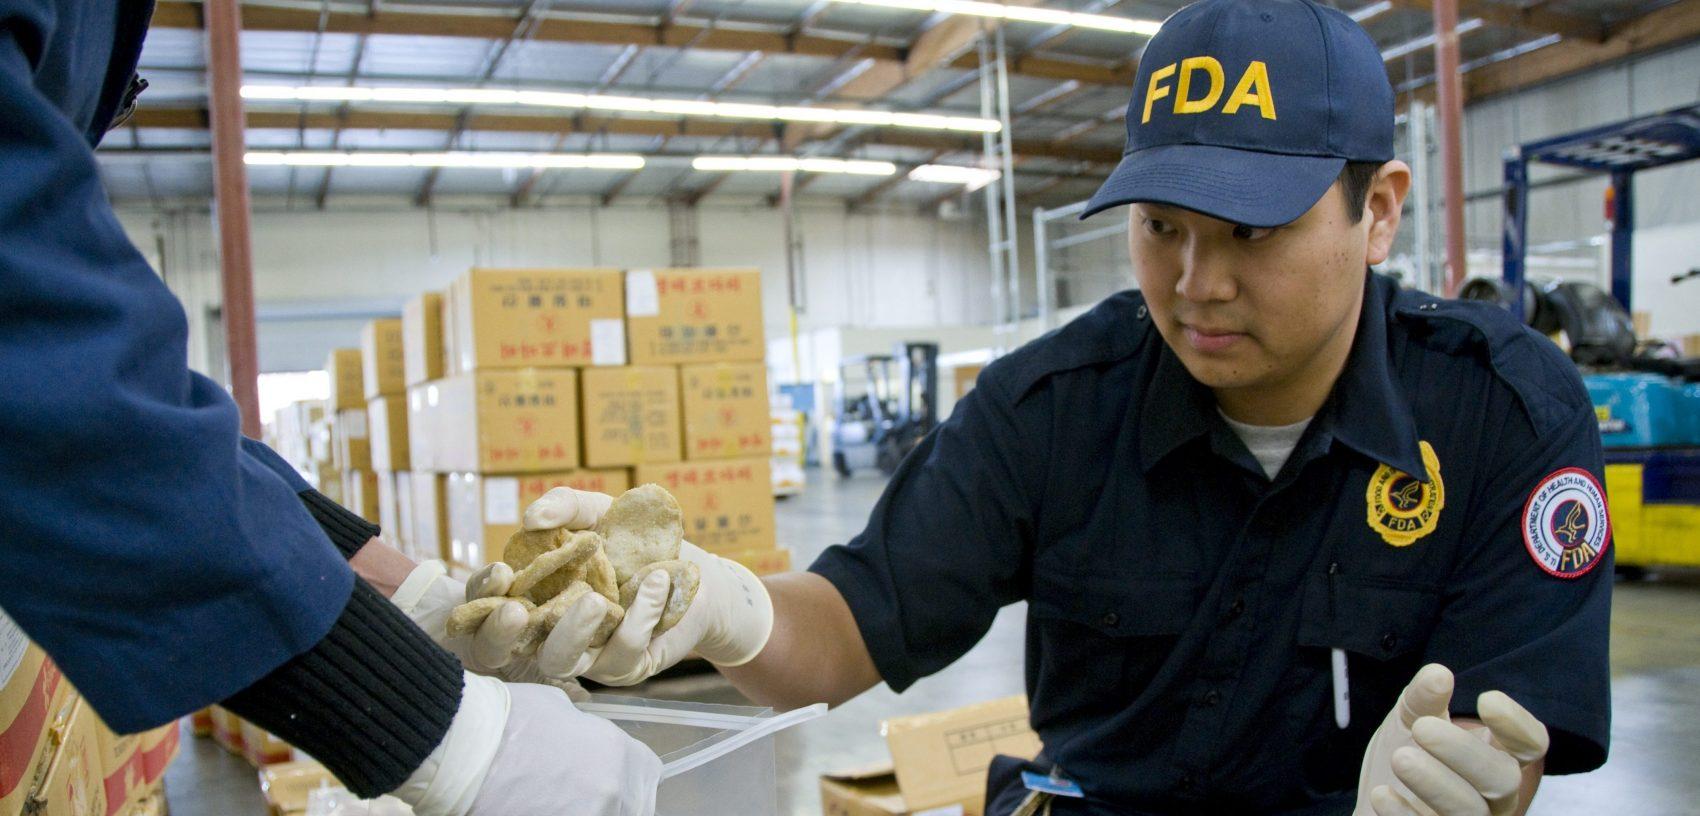 FDA Food Inspector